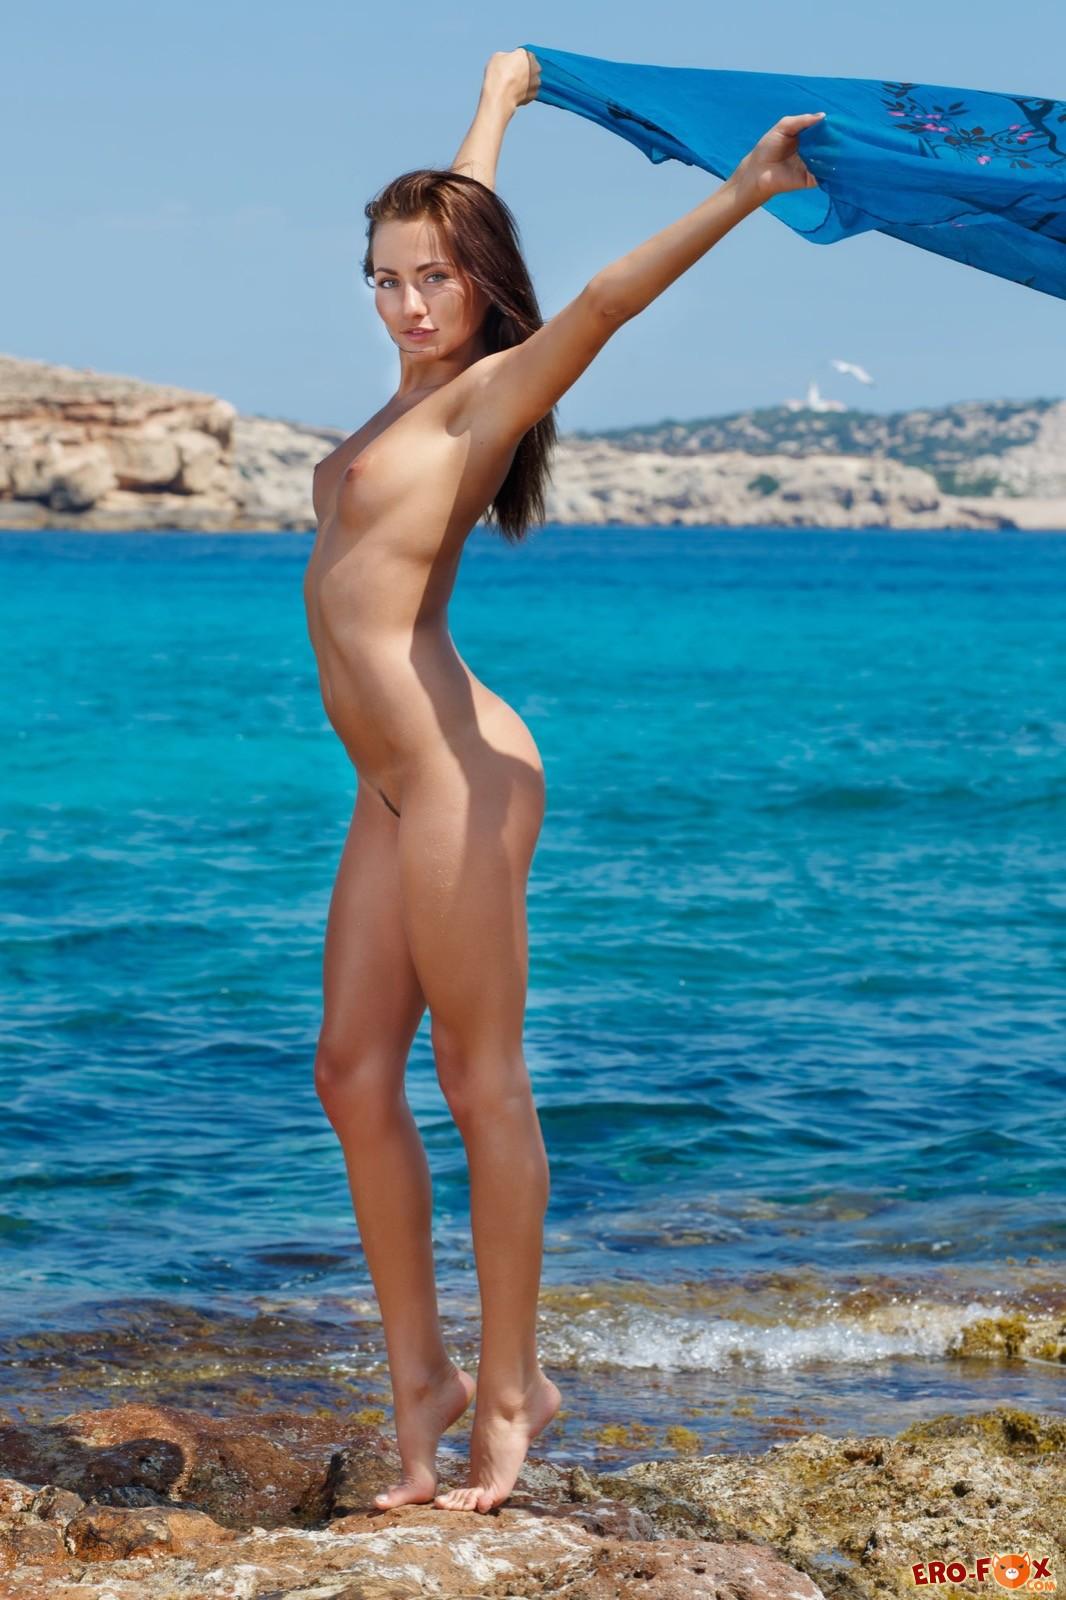 Девушка на каблуках снимает купальник